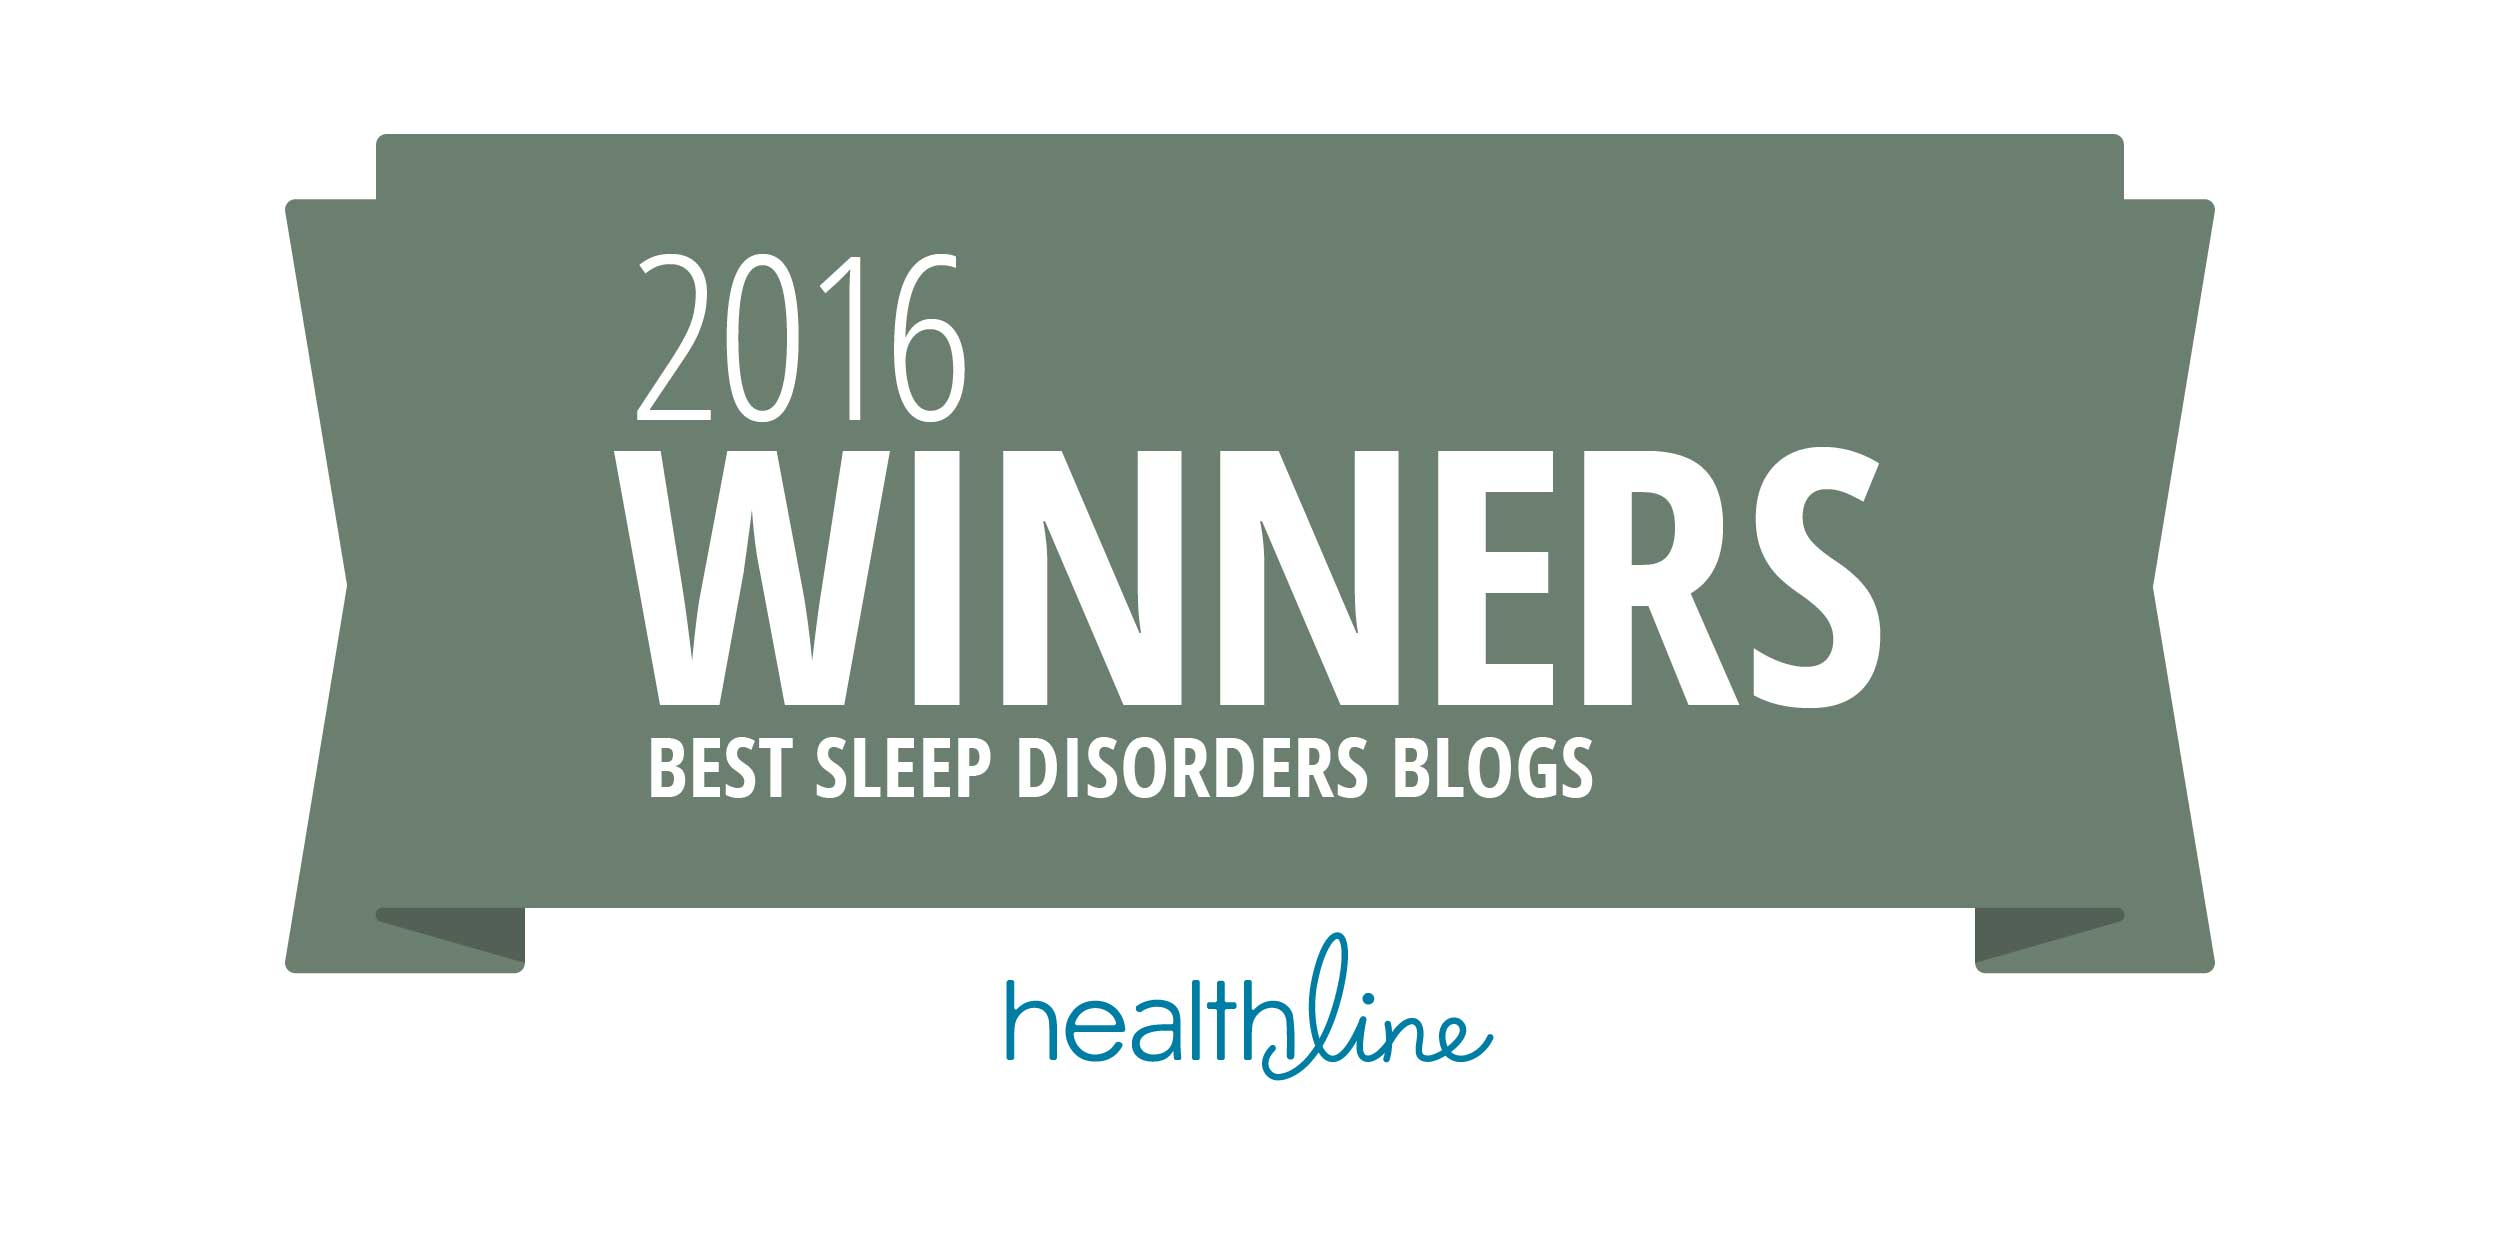 Best Sleep Disorder Blogs